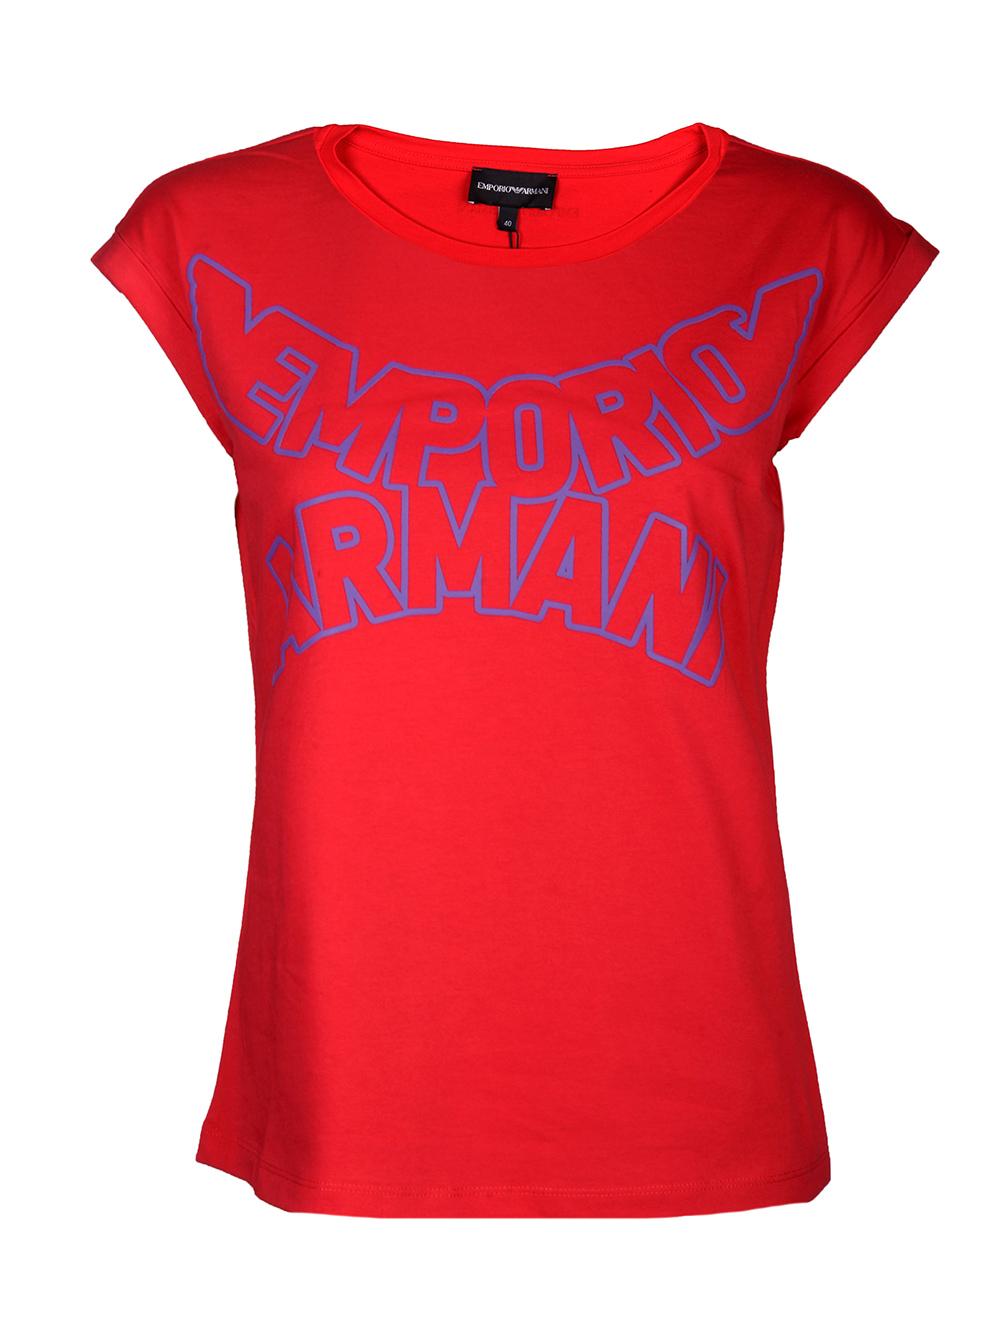 EMPORIO ARMANI Μπλούζα T-shirt 3H2T7S 2J53Z-0334 ΚΟΡΑΛΙ